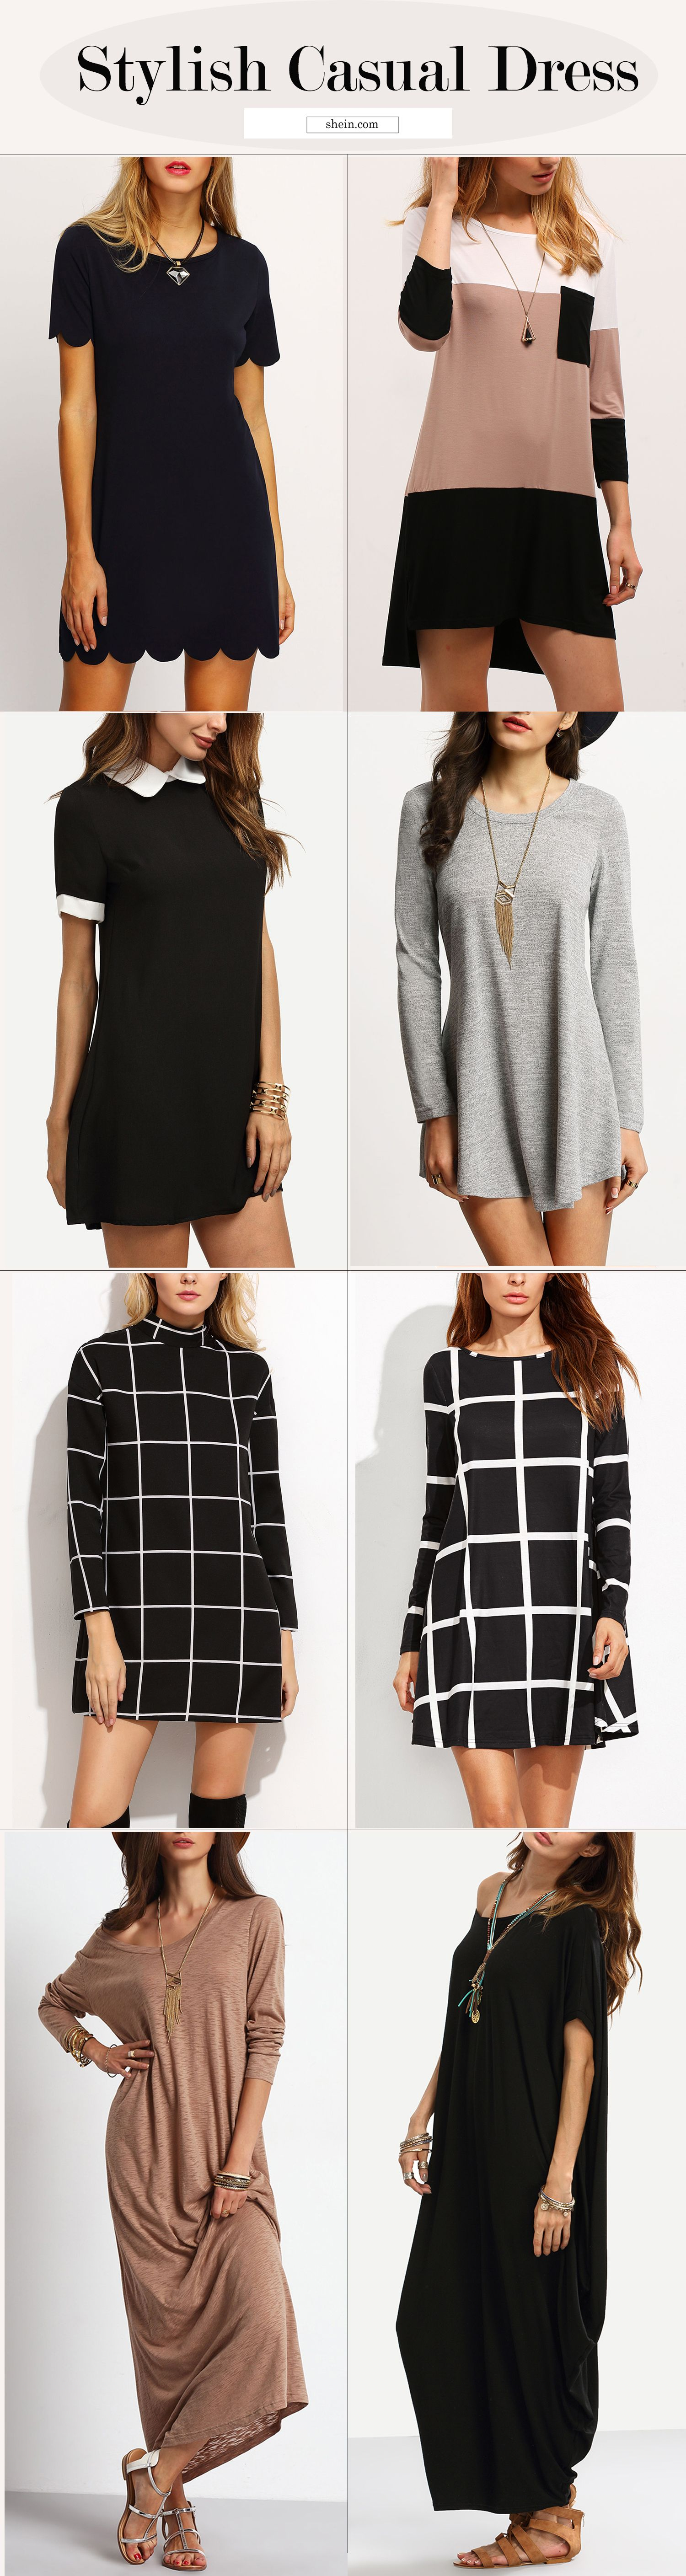 f755161b869c Simple casual dress for women work. Stylish hot sale dress at pinterest.